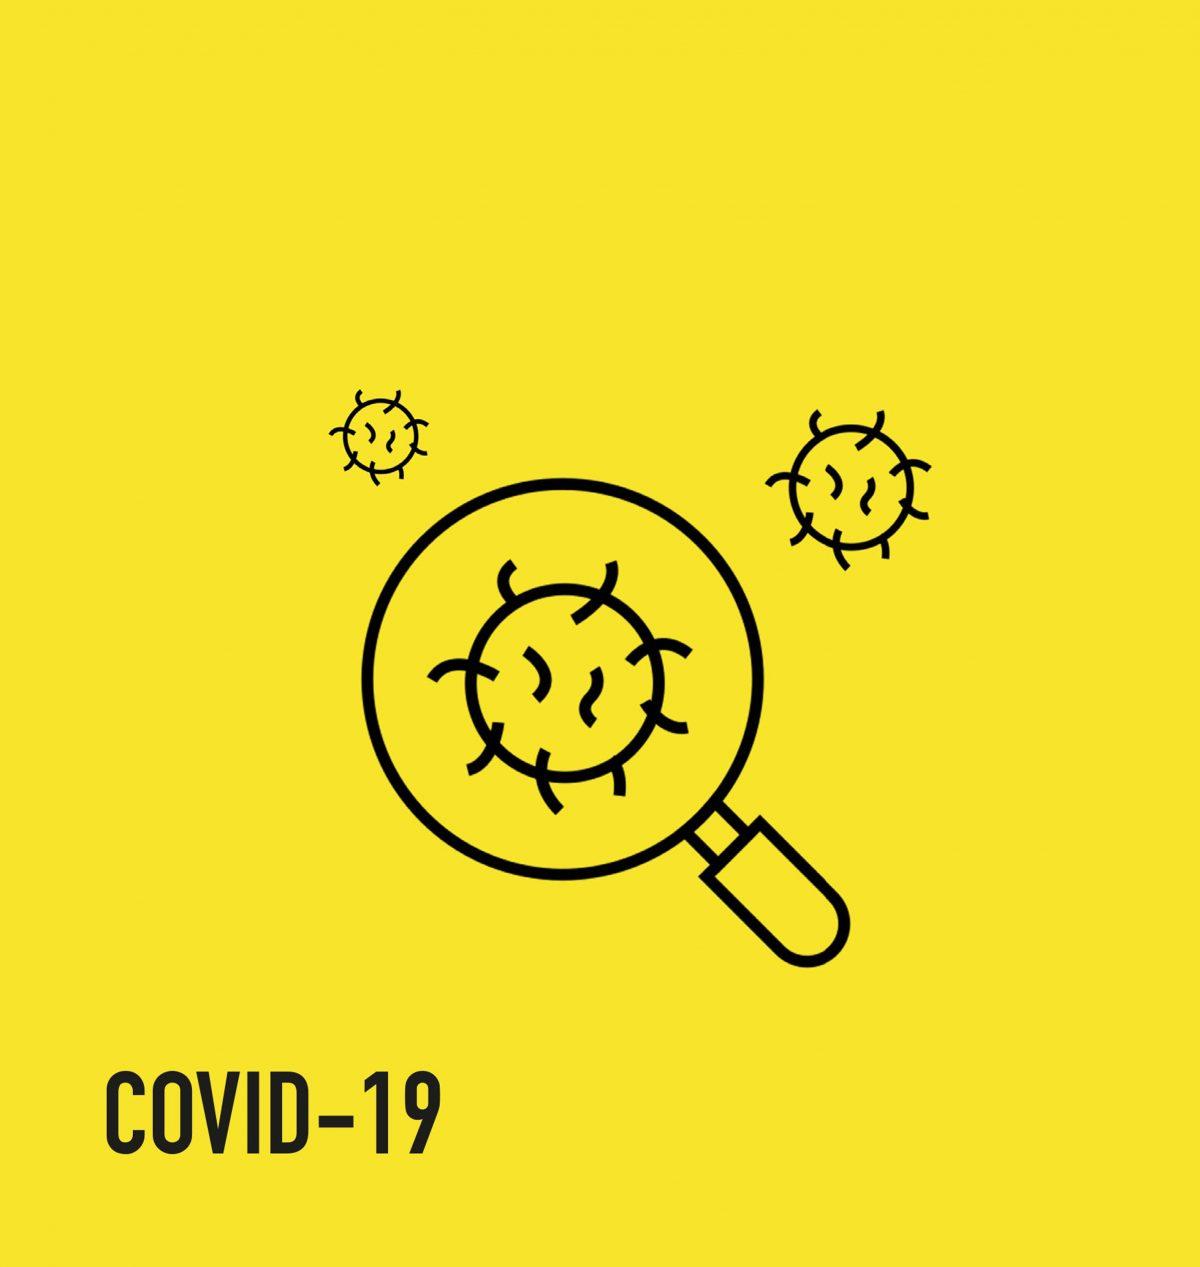 Unser aktuelles Covid-19 Statement.